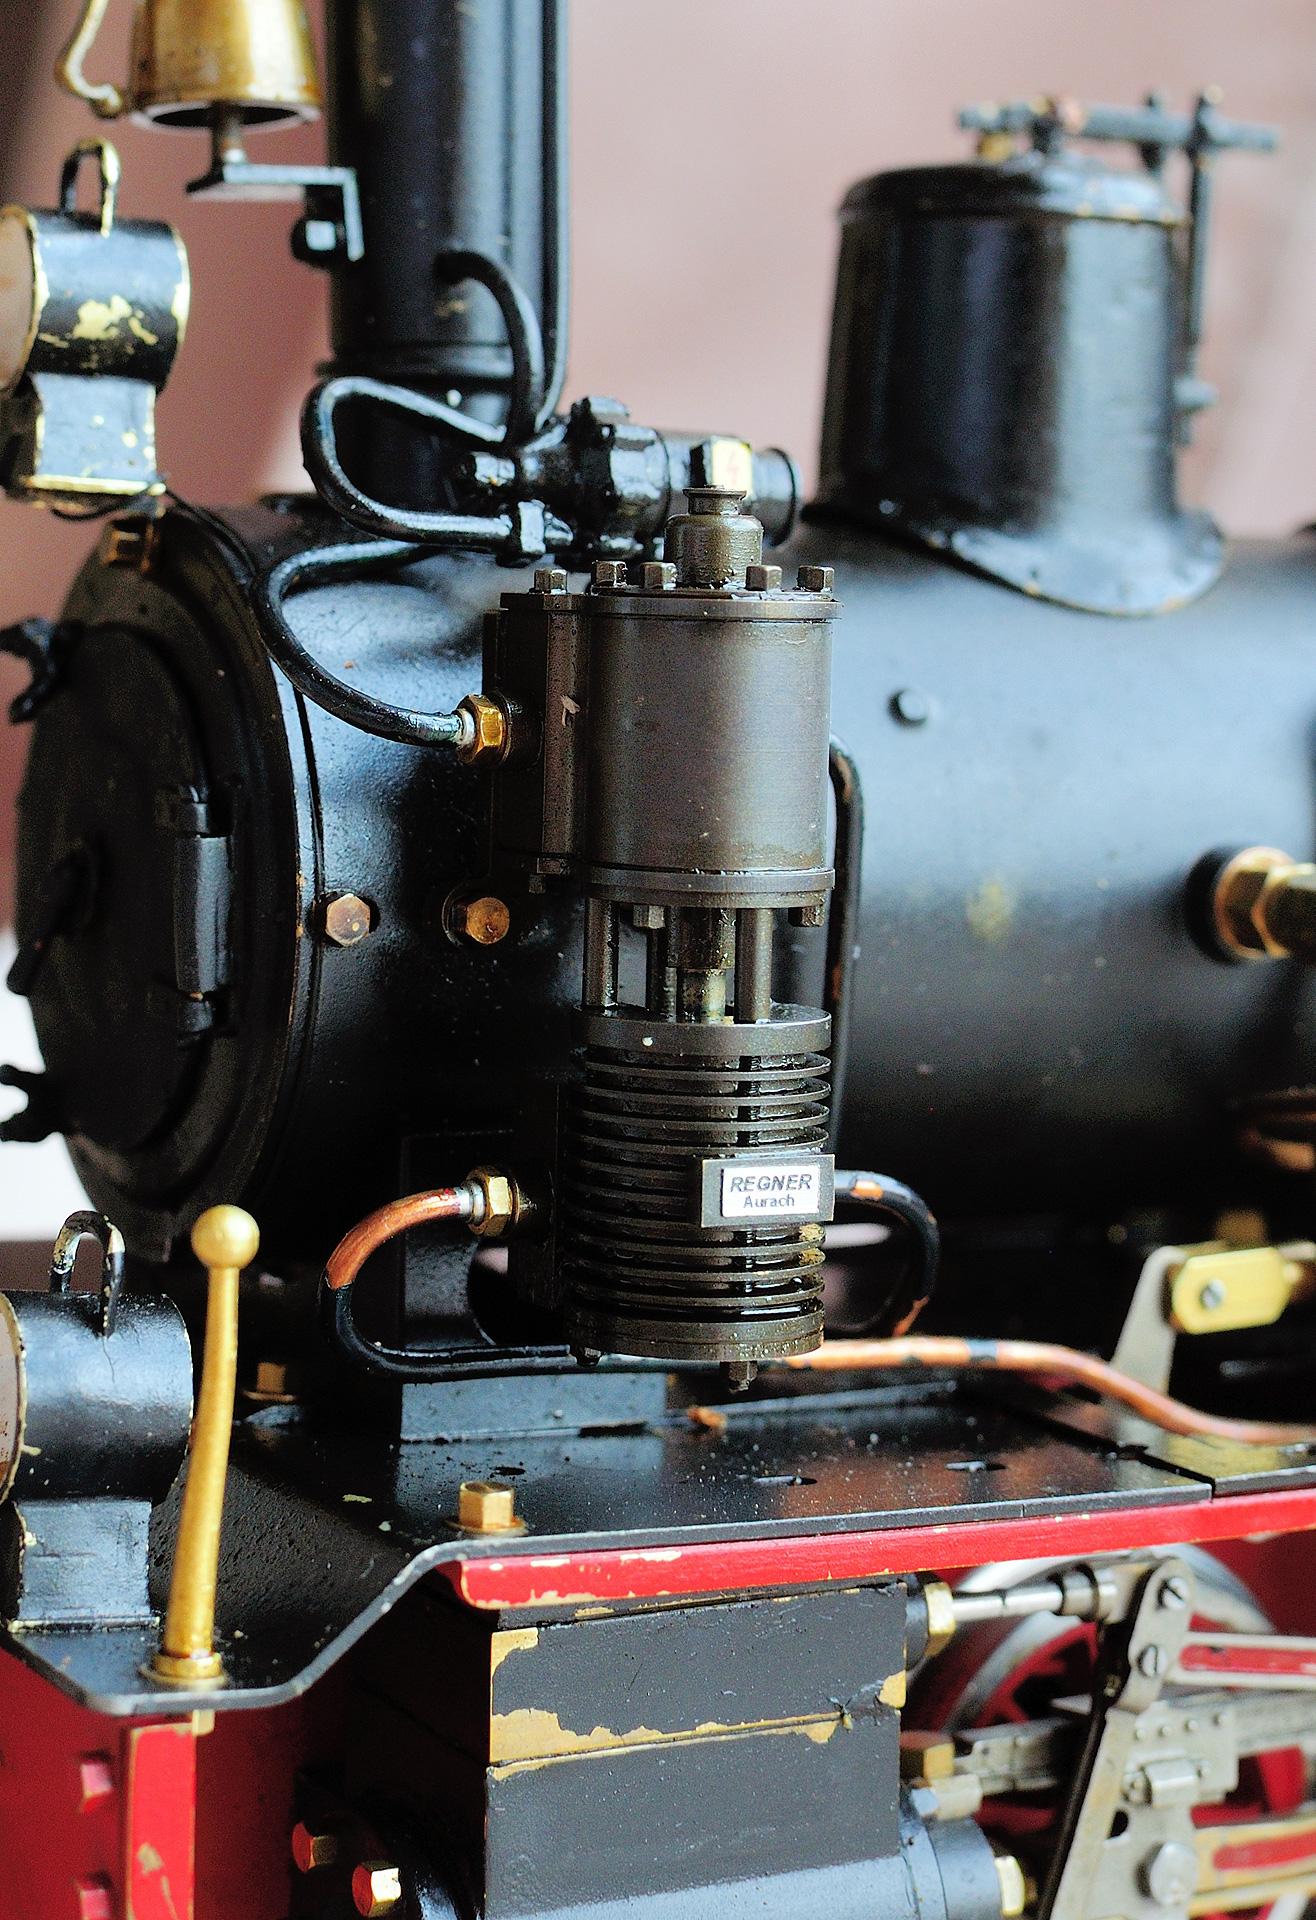 Dampfspeisepumpe an Regner C-Kuppler Kessel montieren